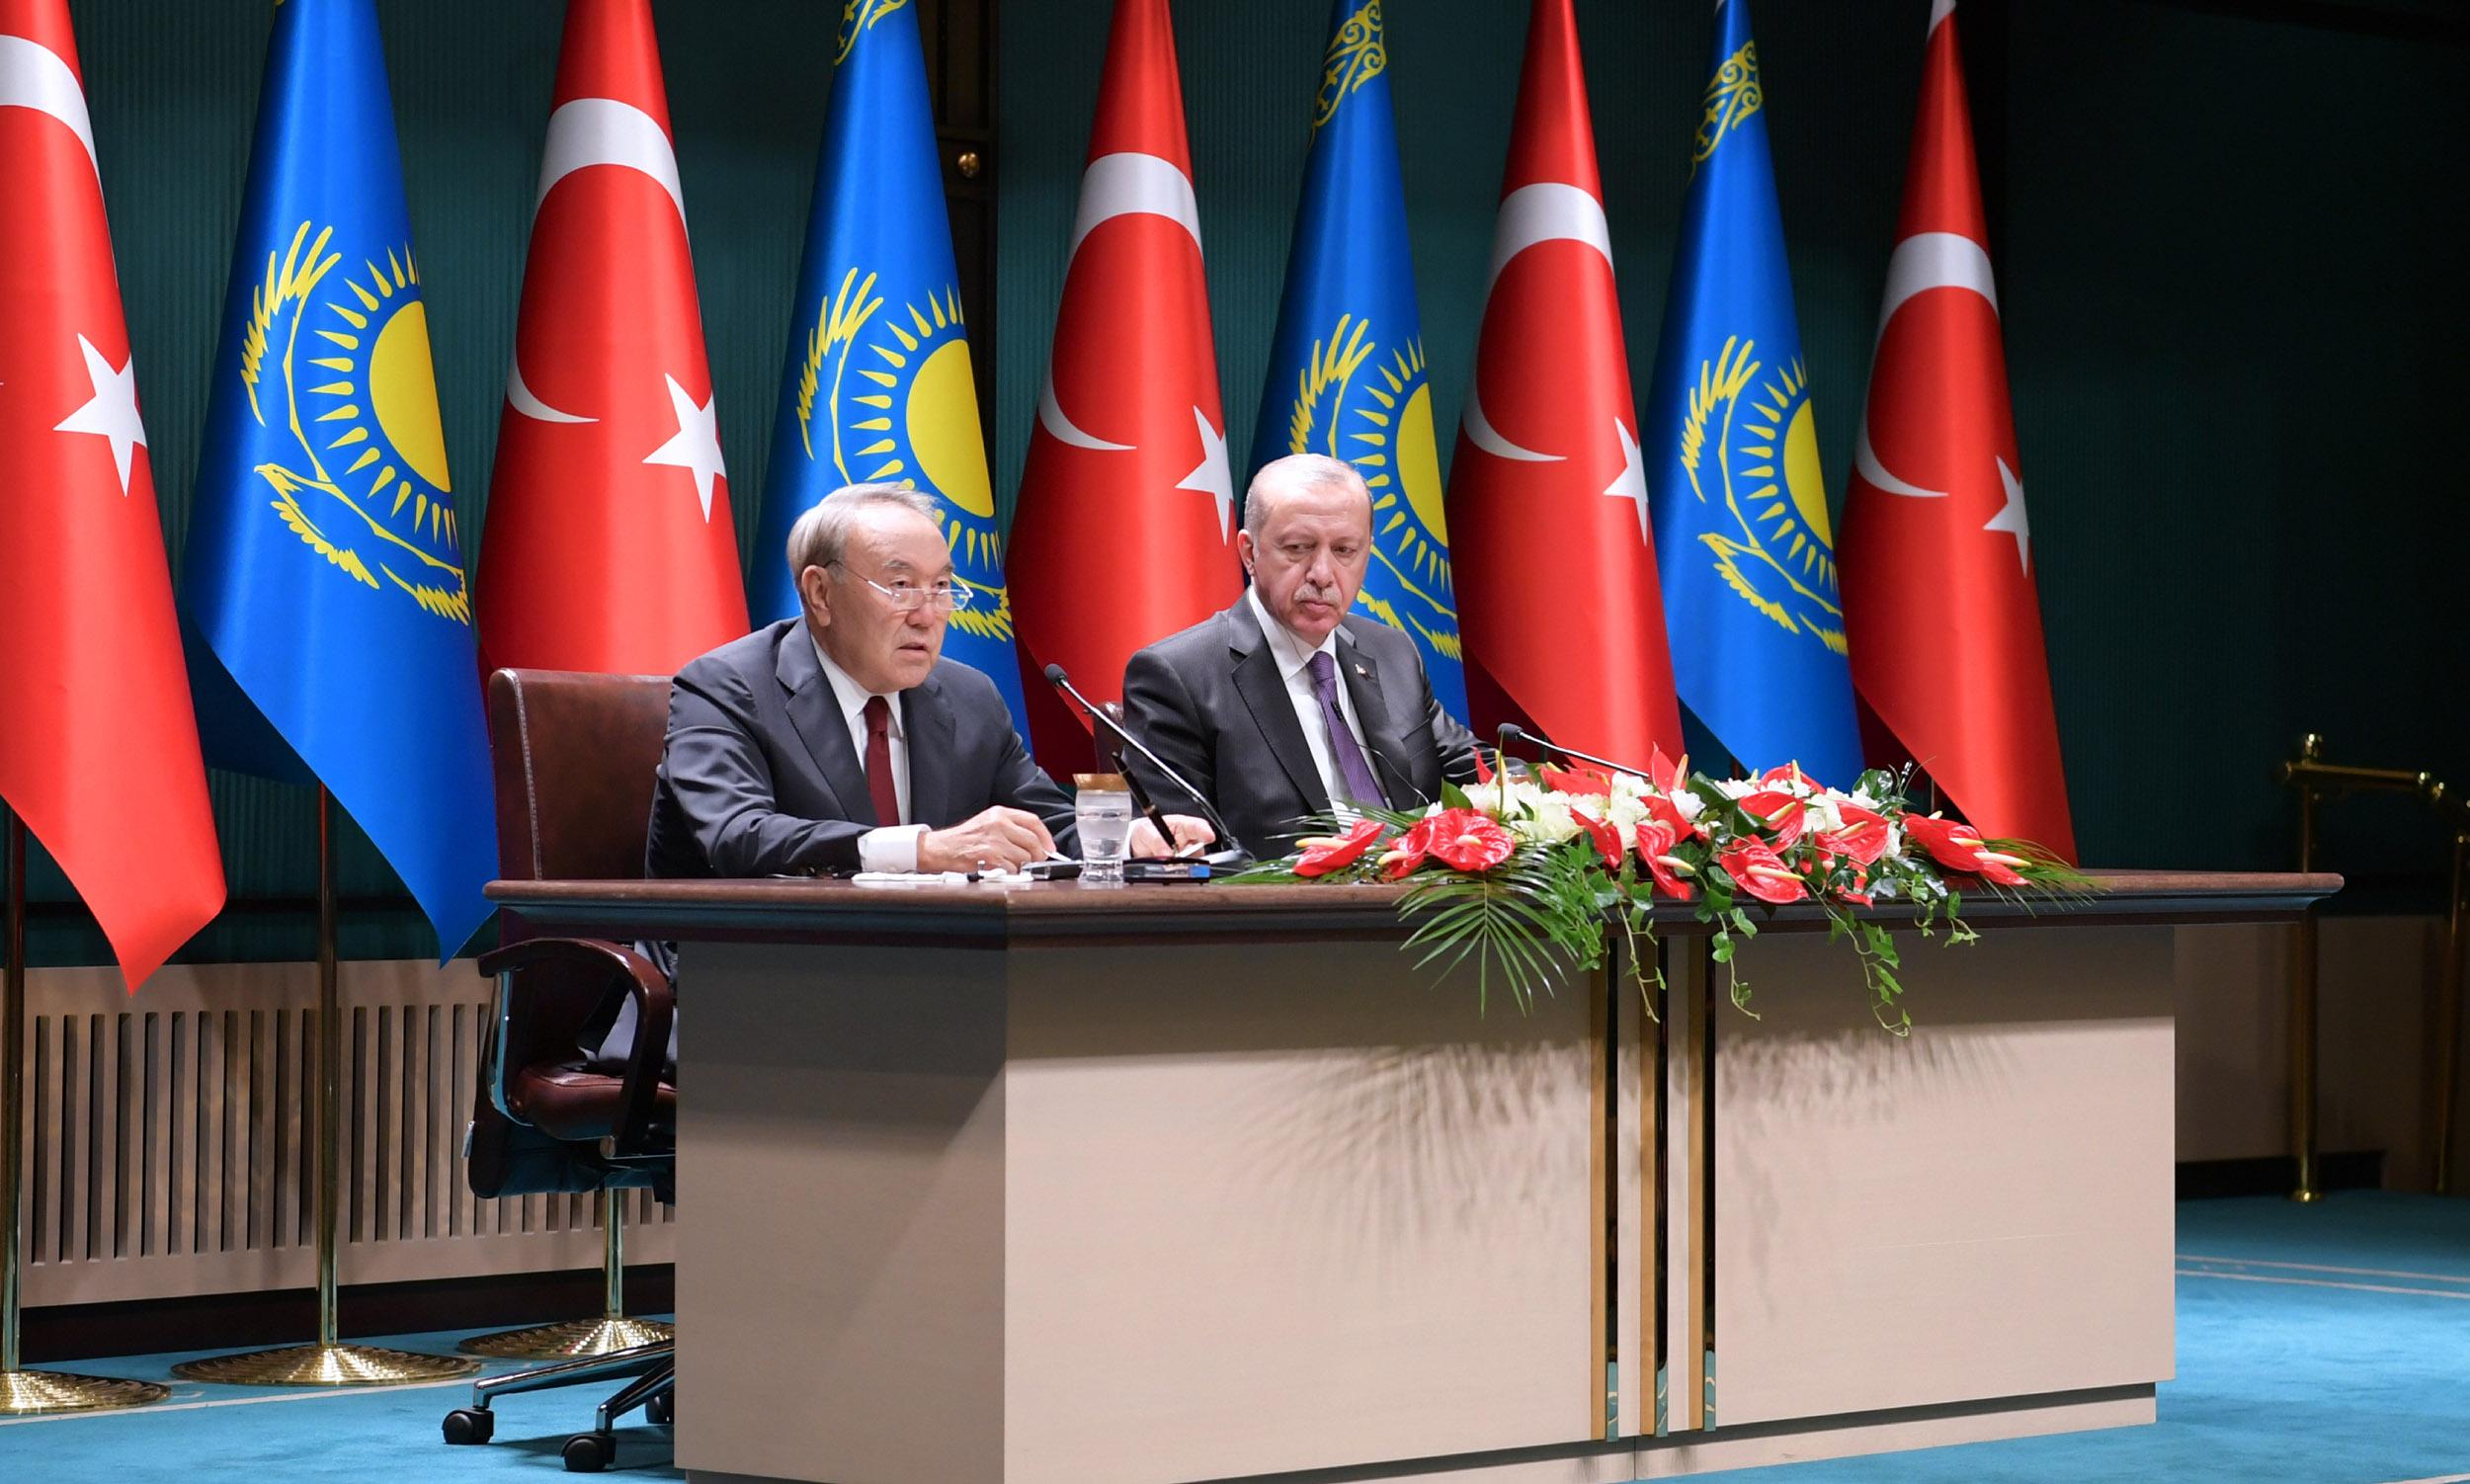 Казахстан и Турция намерены довести товарооборот до $5 млрд